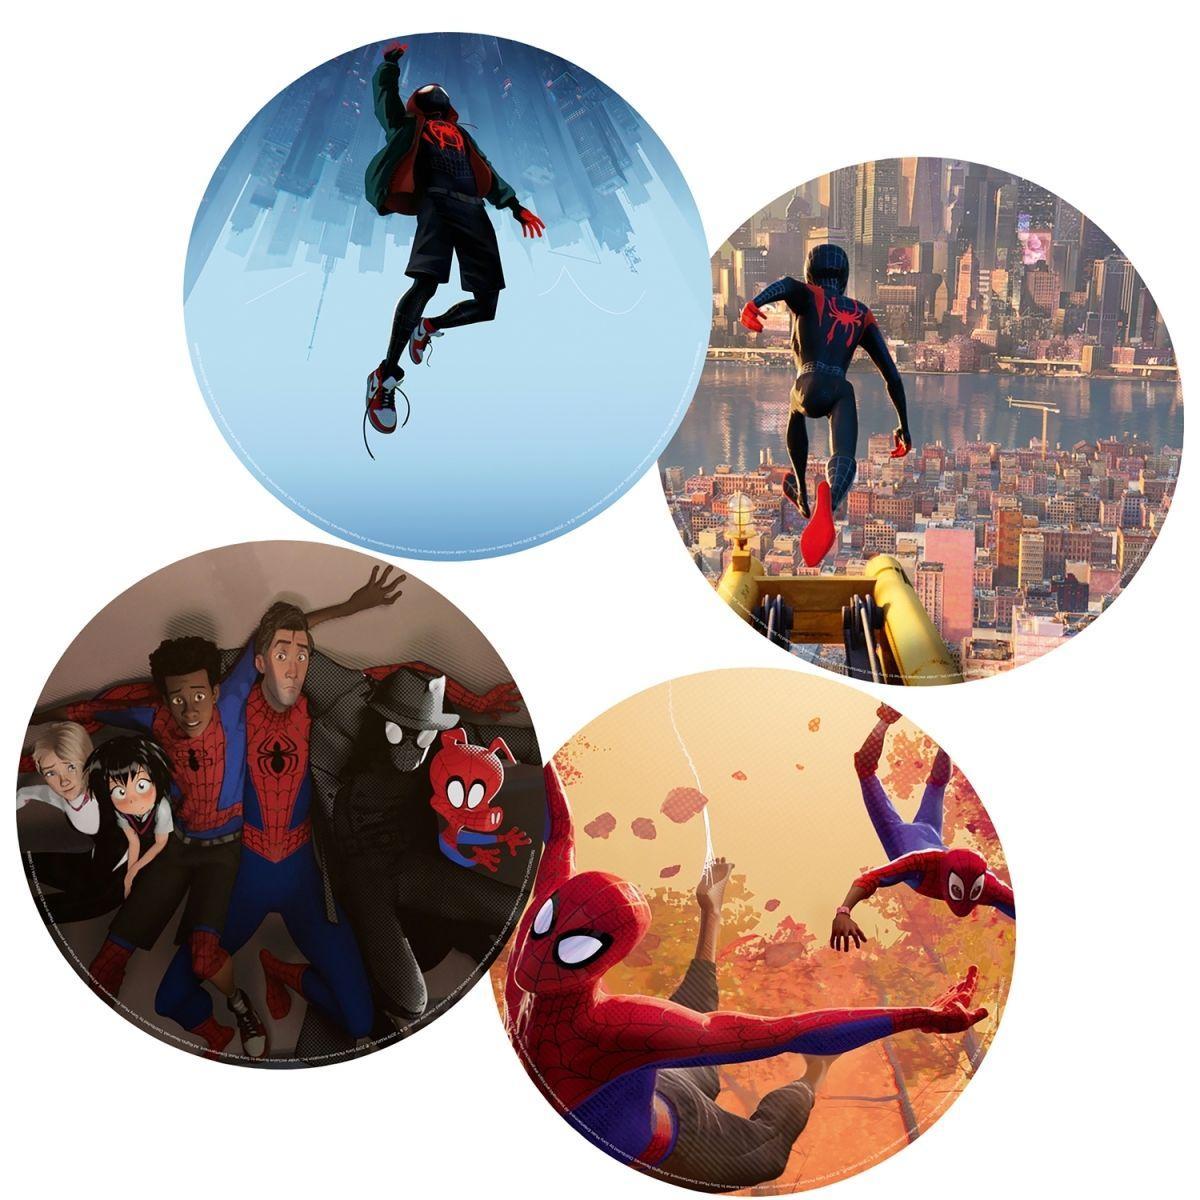 цена на Саундтрек Саундтрек - Spider-man: Into The Spider-verse (2 Lp, Picture)